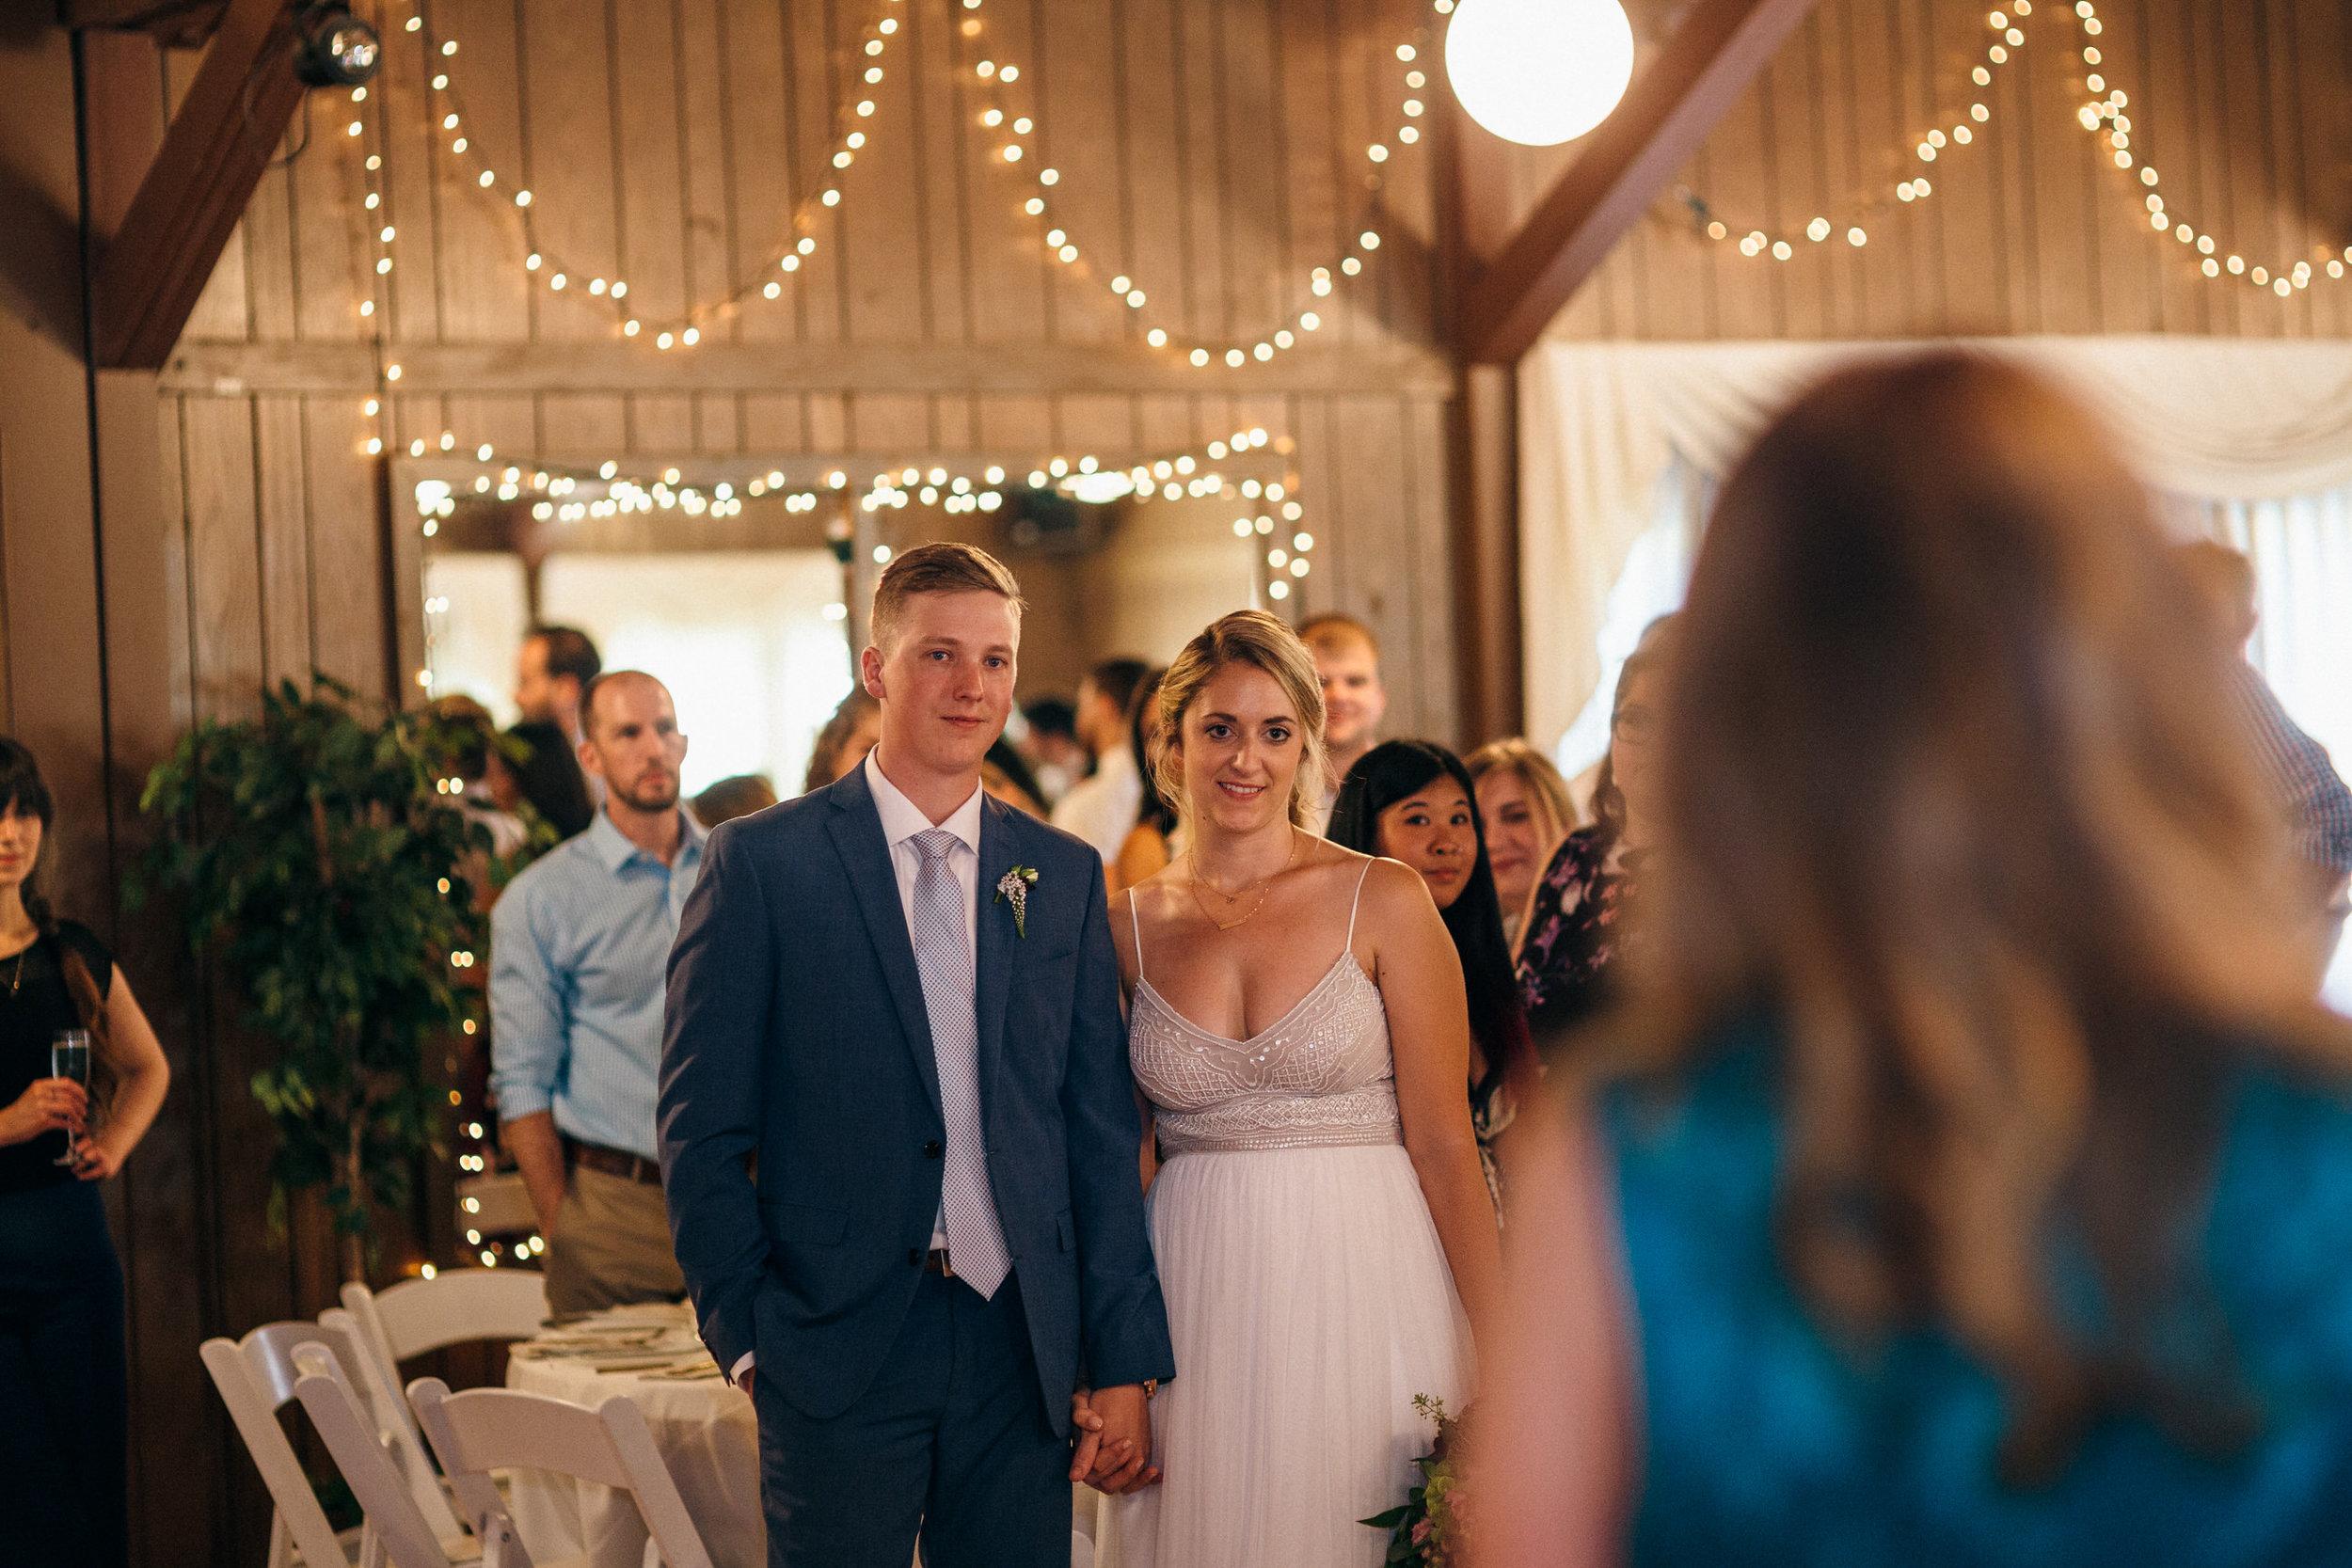 Laurelhurst Park club wedding photographer Portand pdx Oregon076.JPG